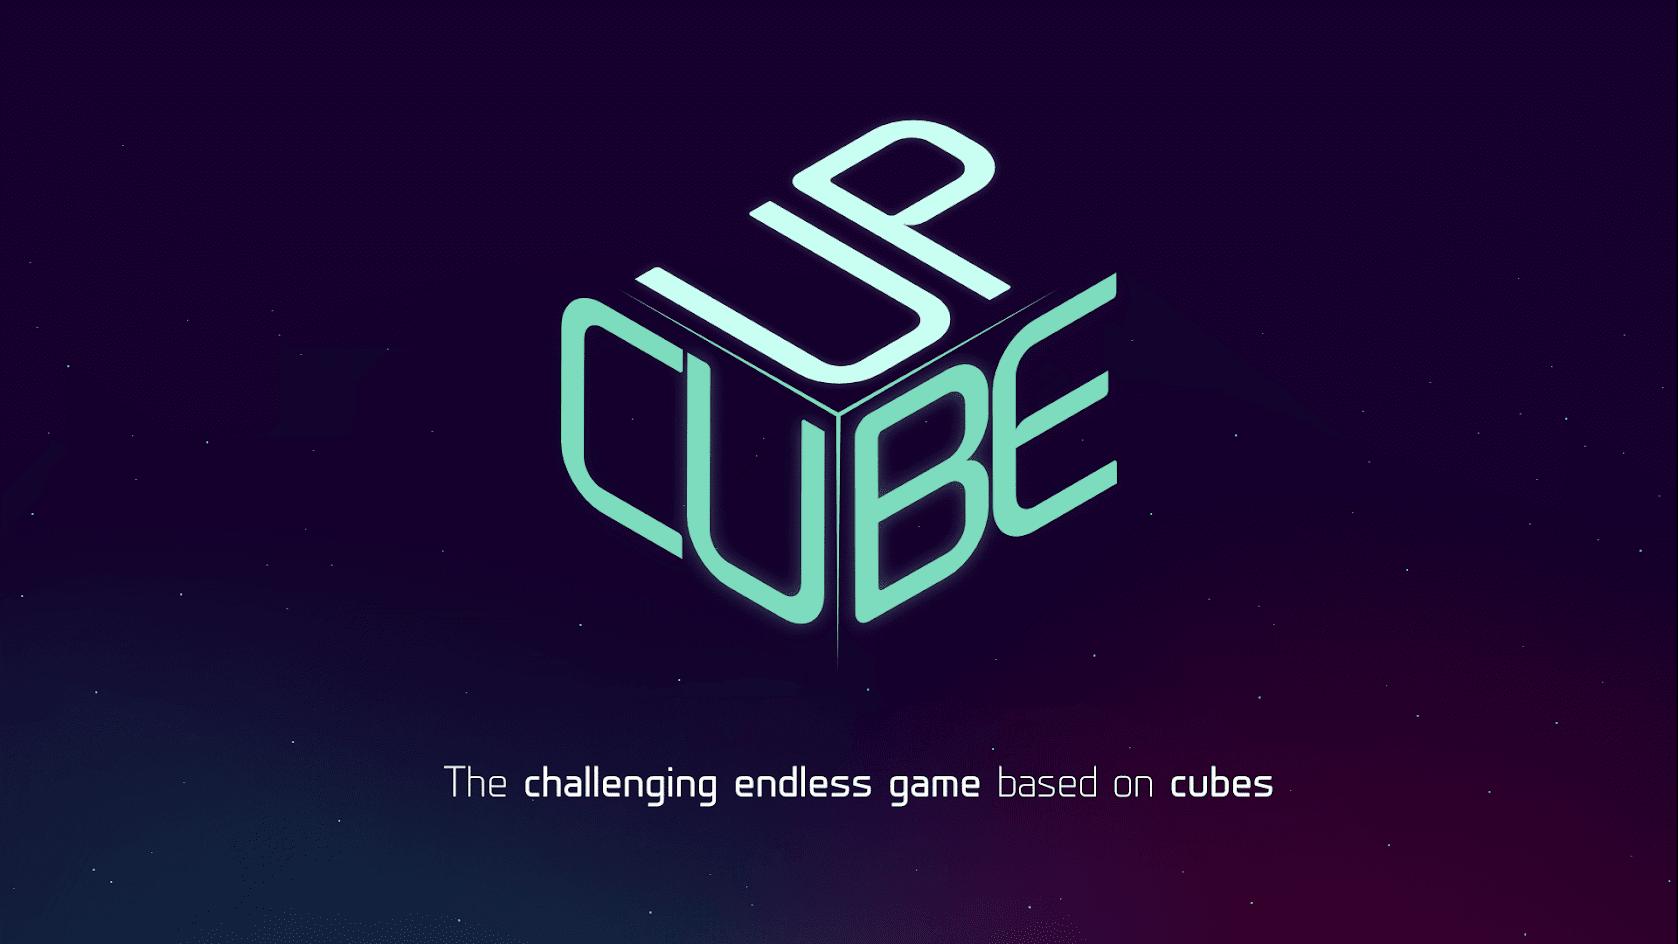 cubeup-logo